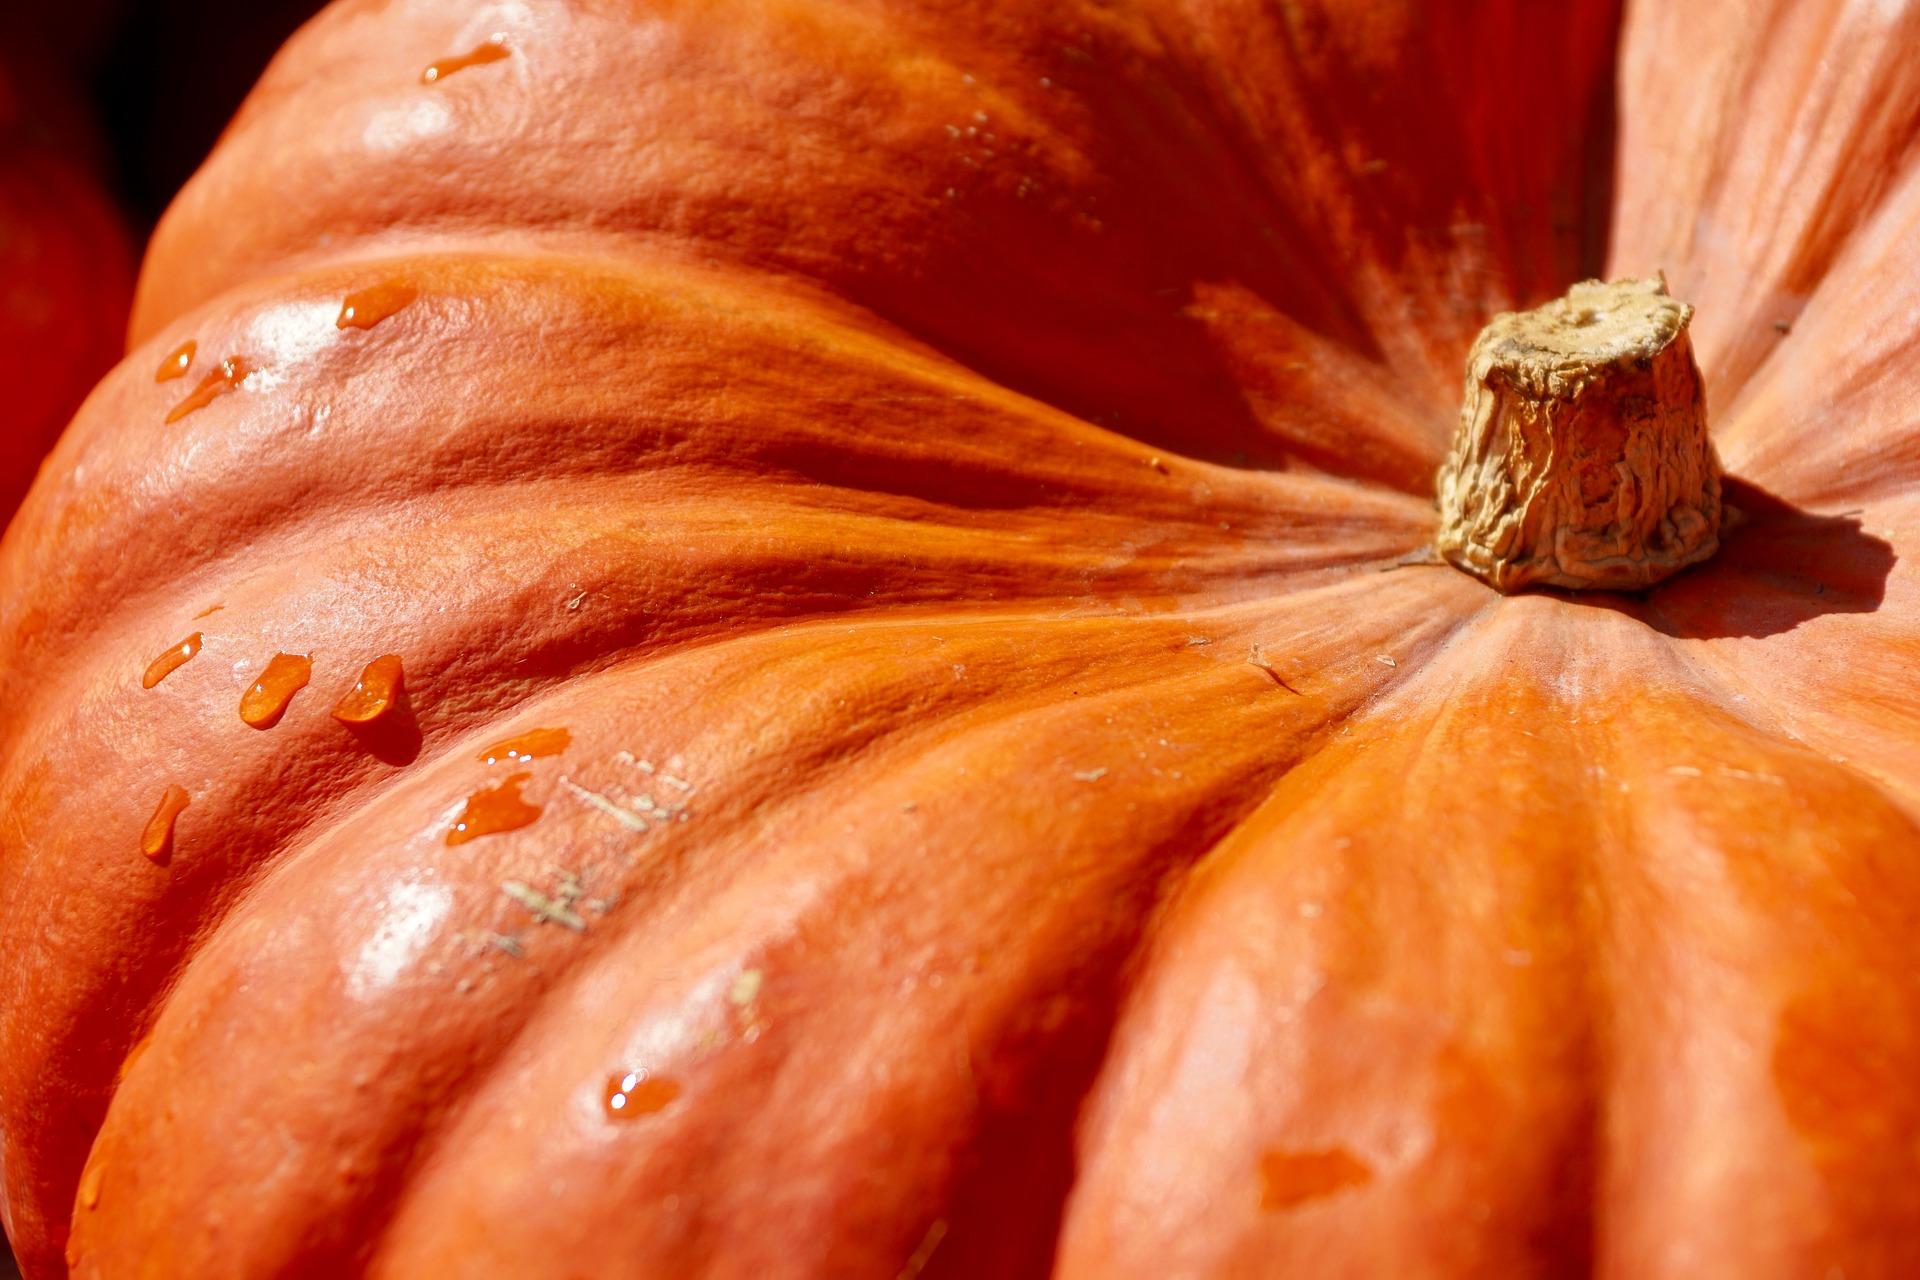 Photo of a Pumpkin Top Close Up